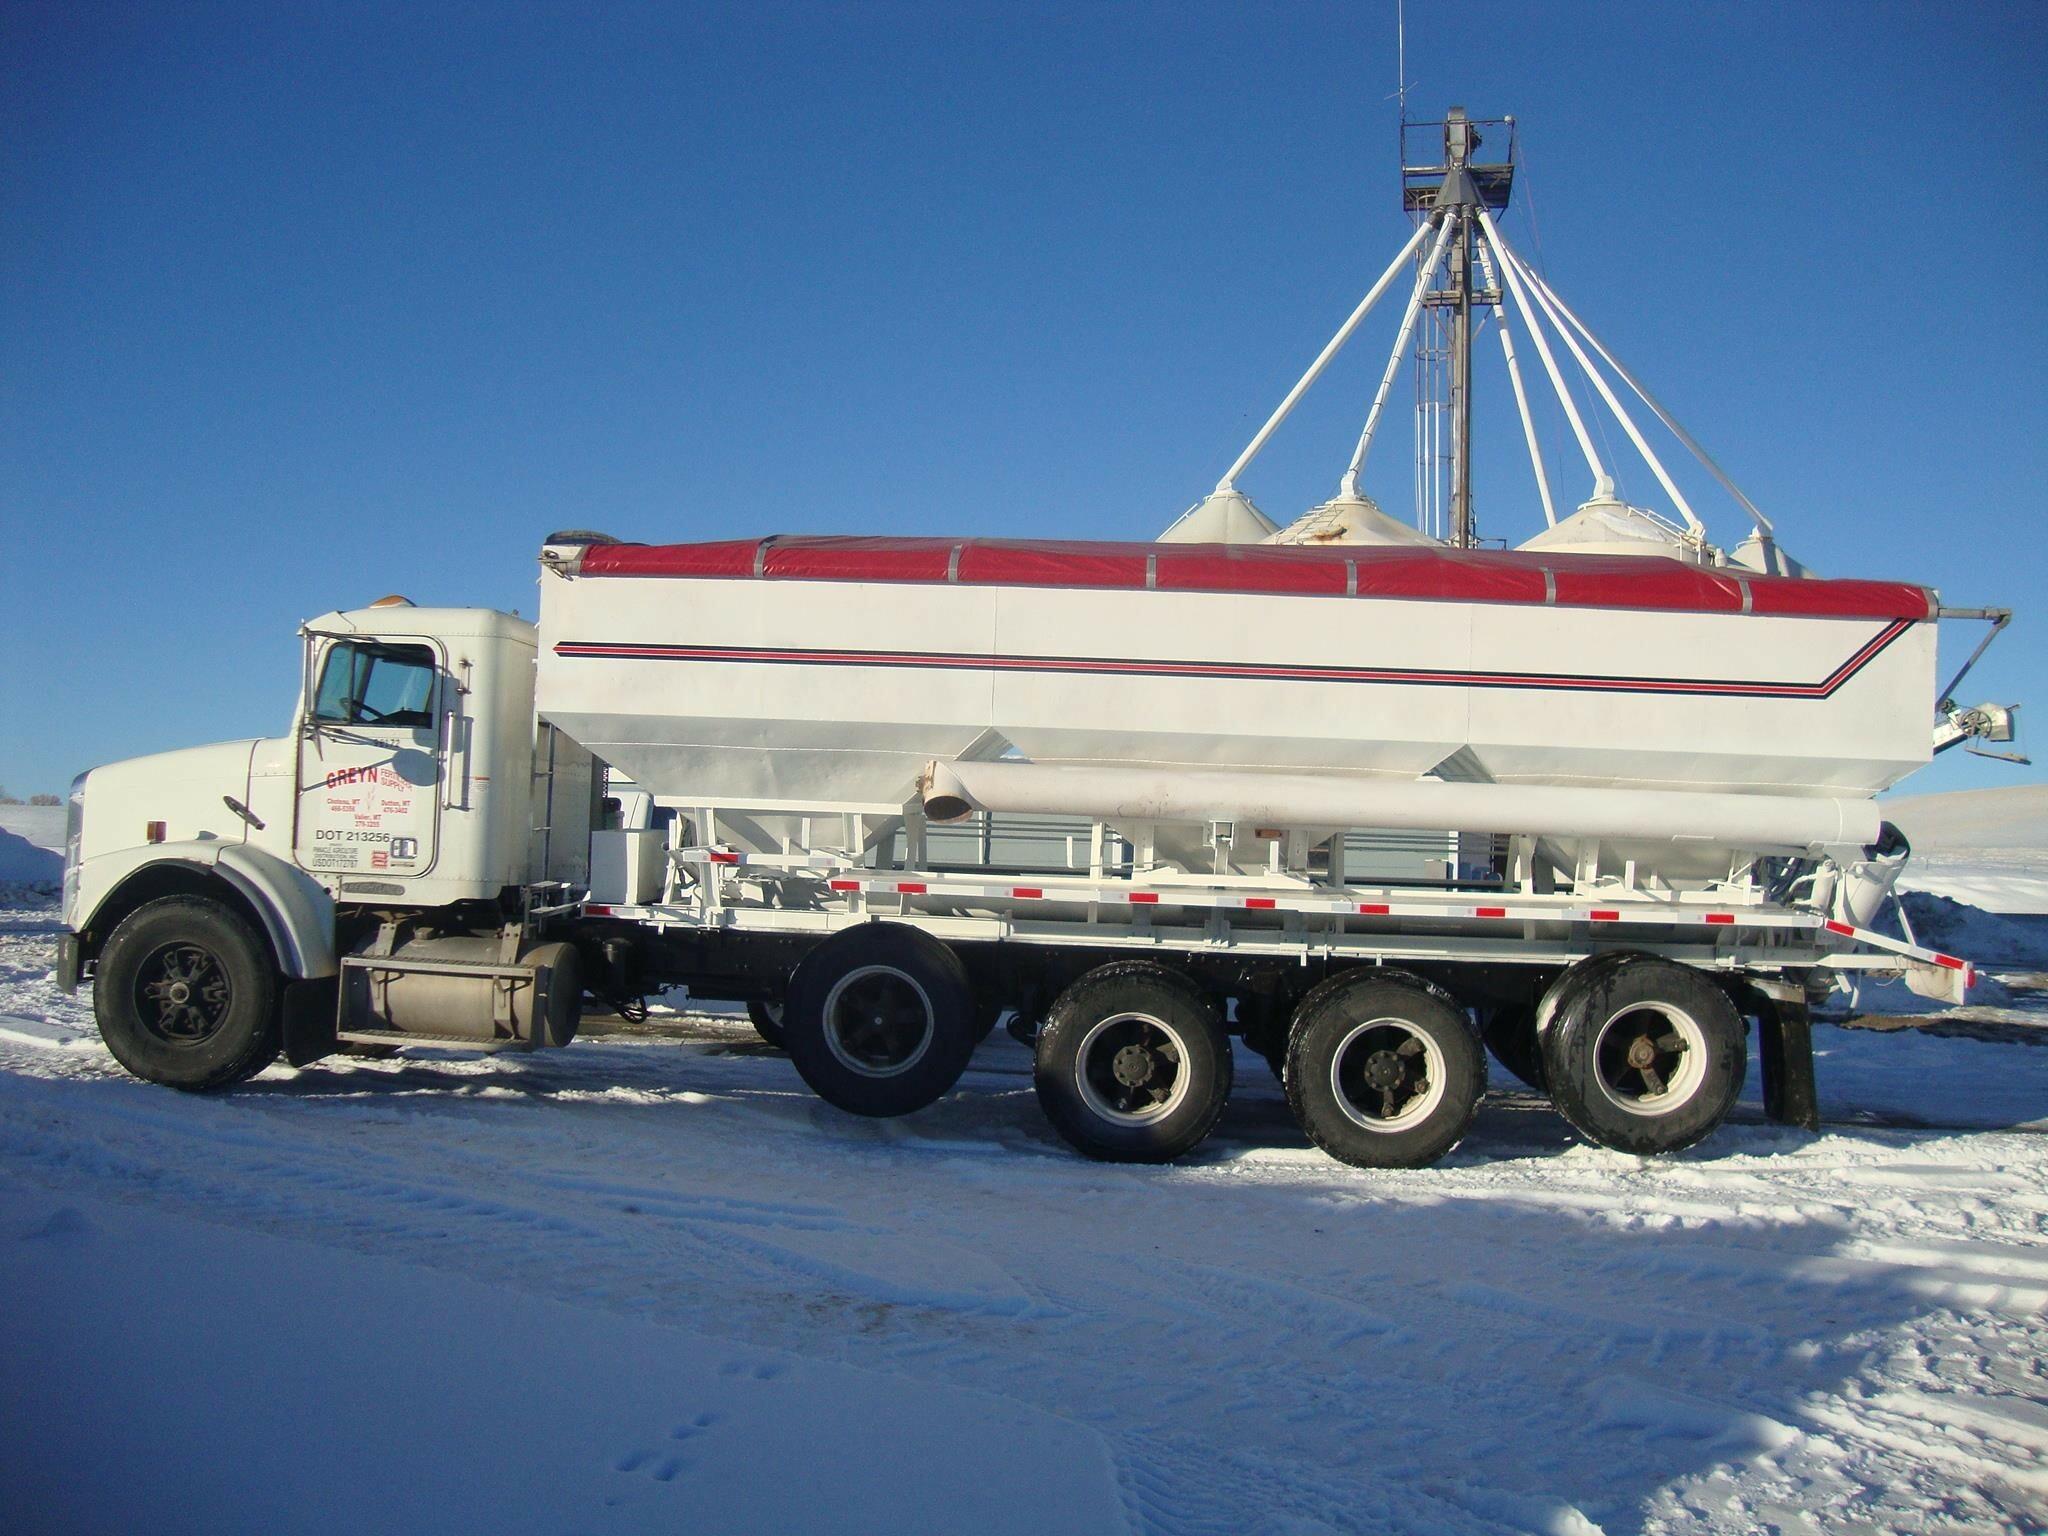 1996 Freightliner FLC120 Grain Truck